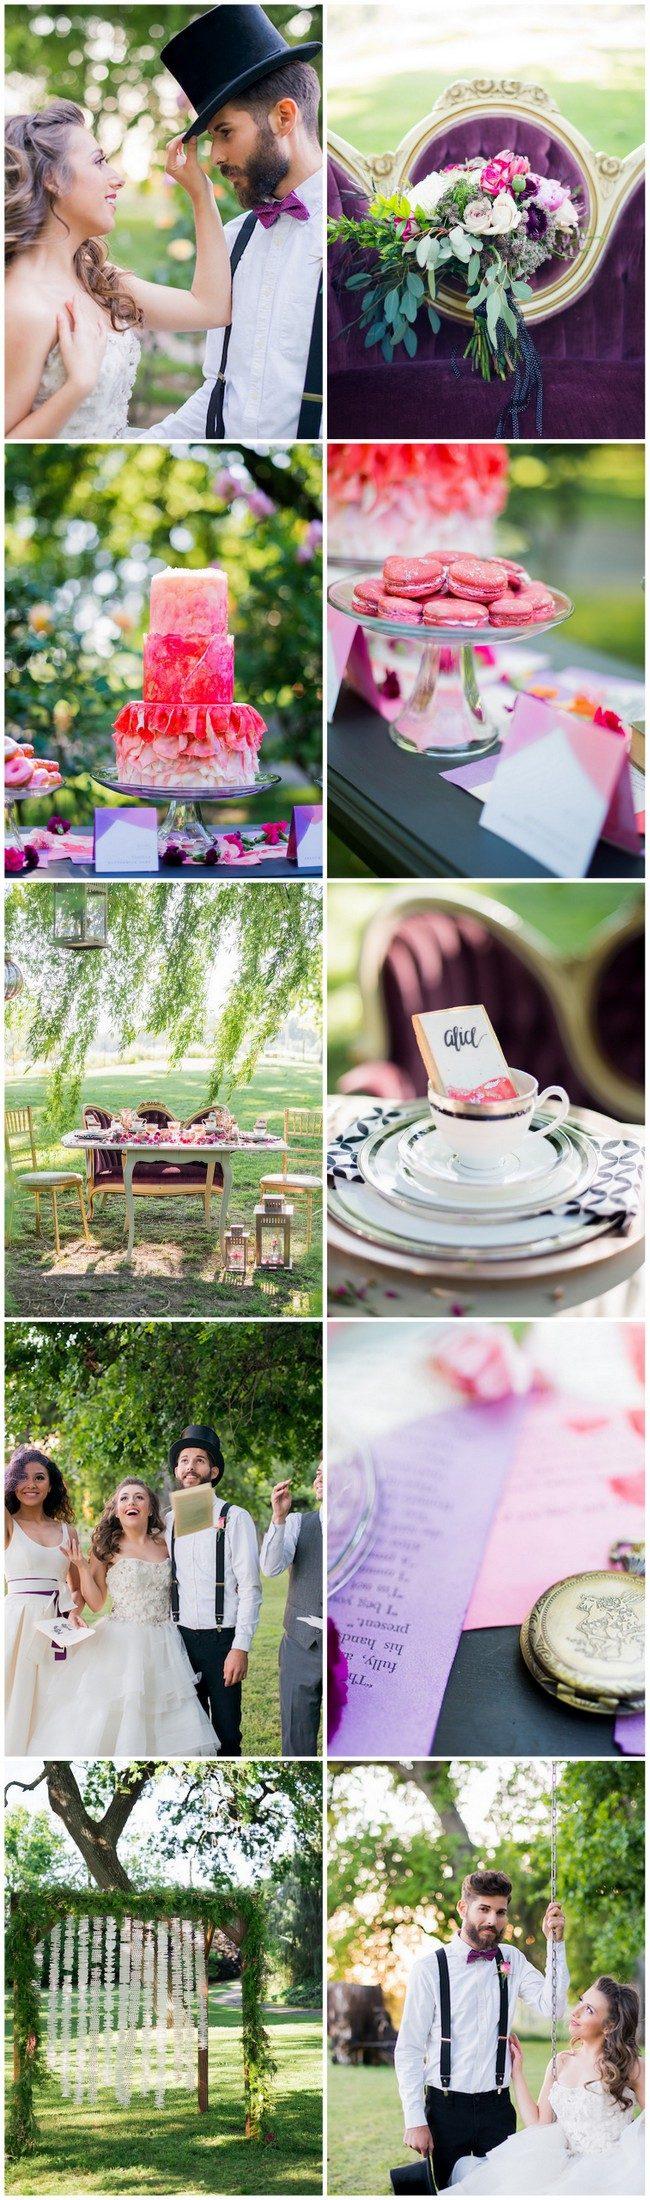 Luxury Alice In Wonderland Garden Ideas Gallery - Beautiful Garden ...